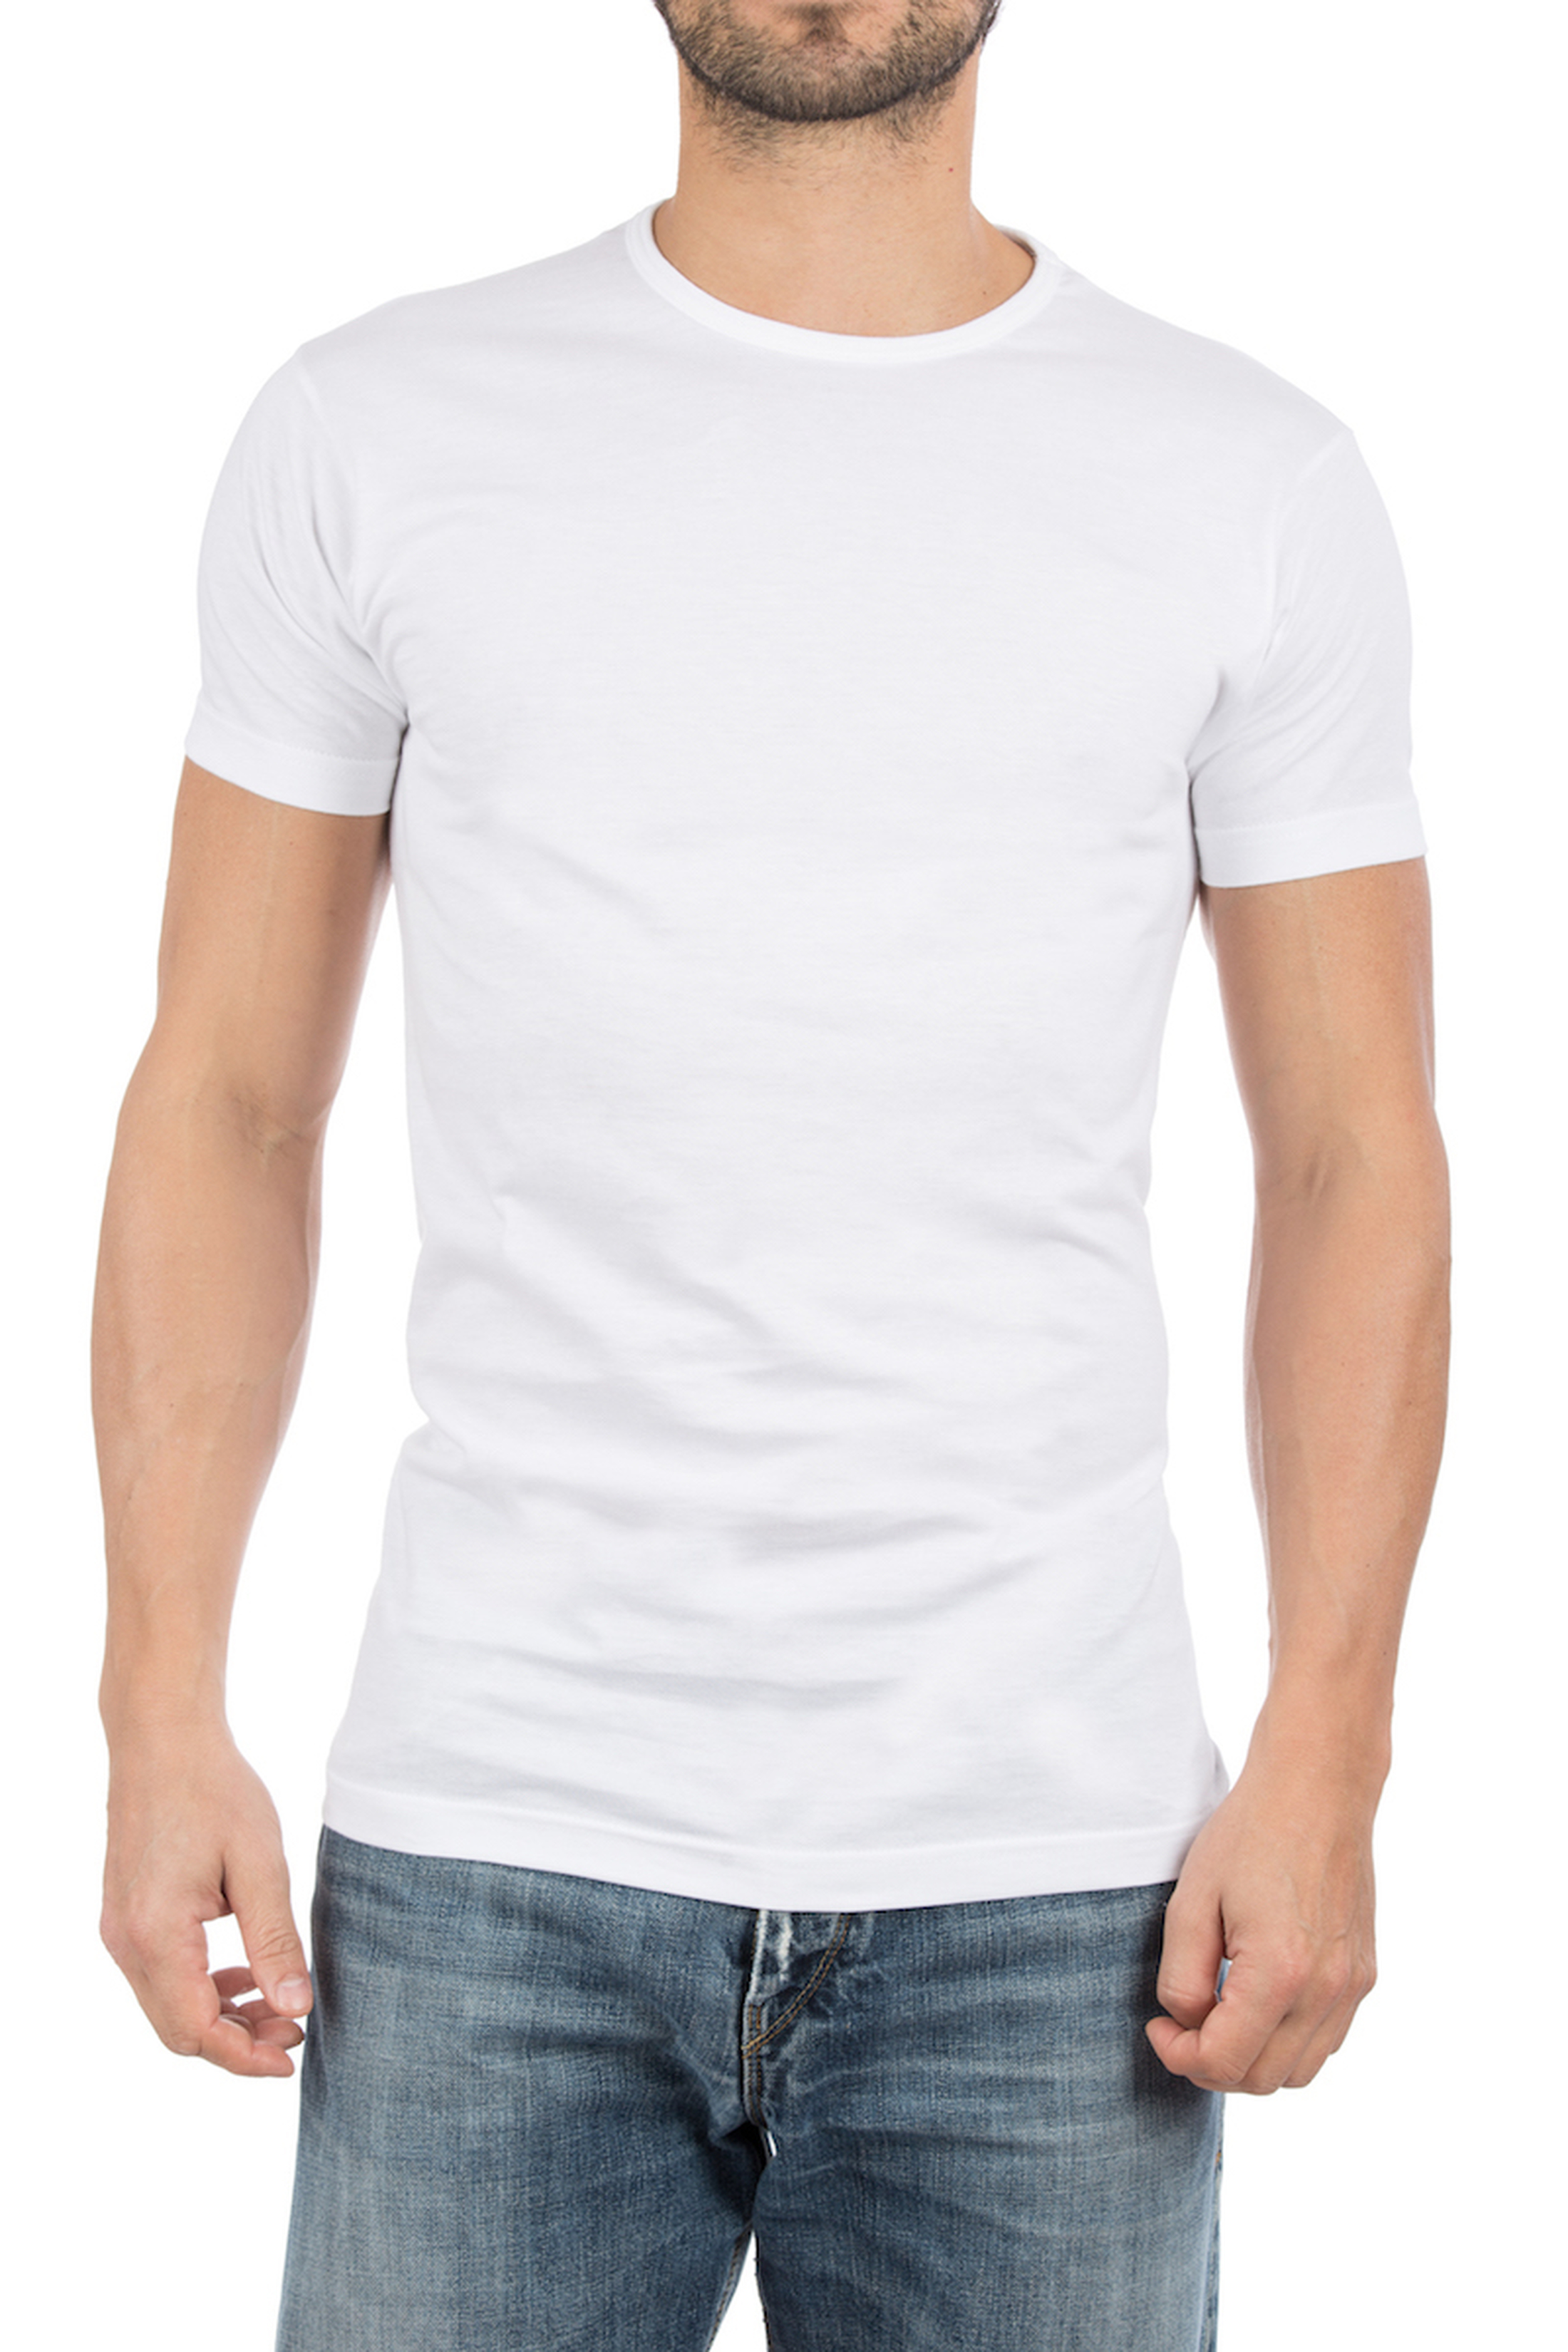 Alan Red Derby Round Neck T-shirt White 2-Pack photo 5